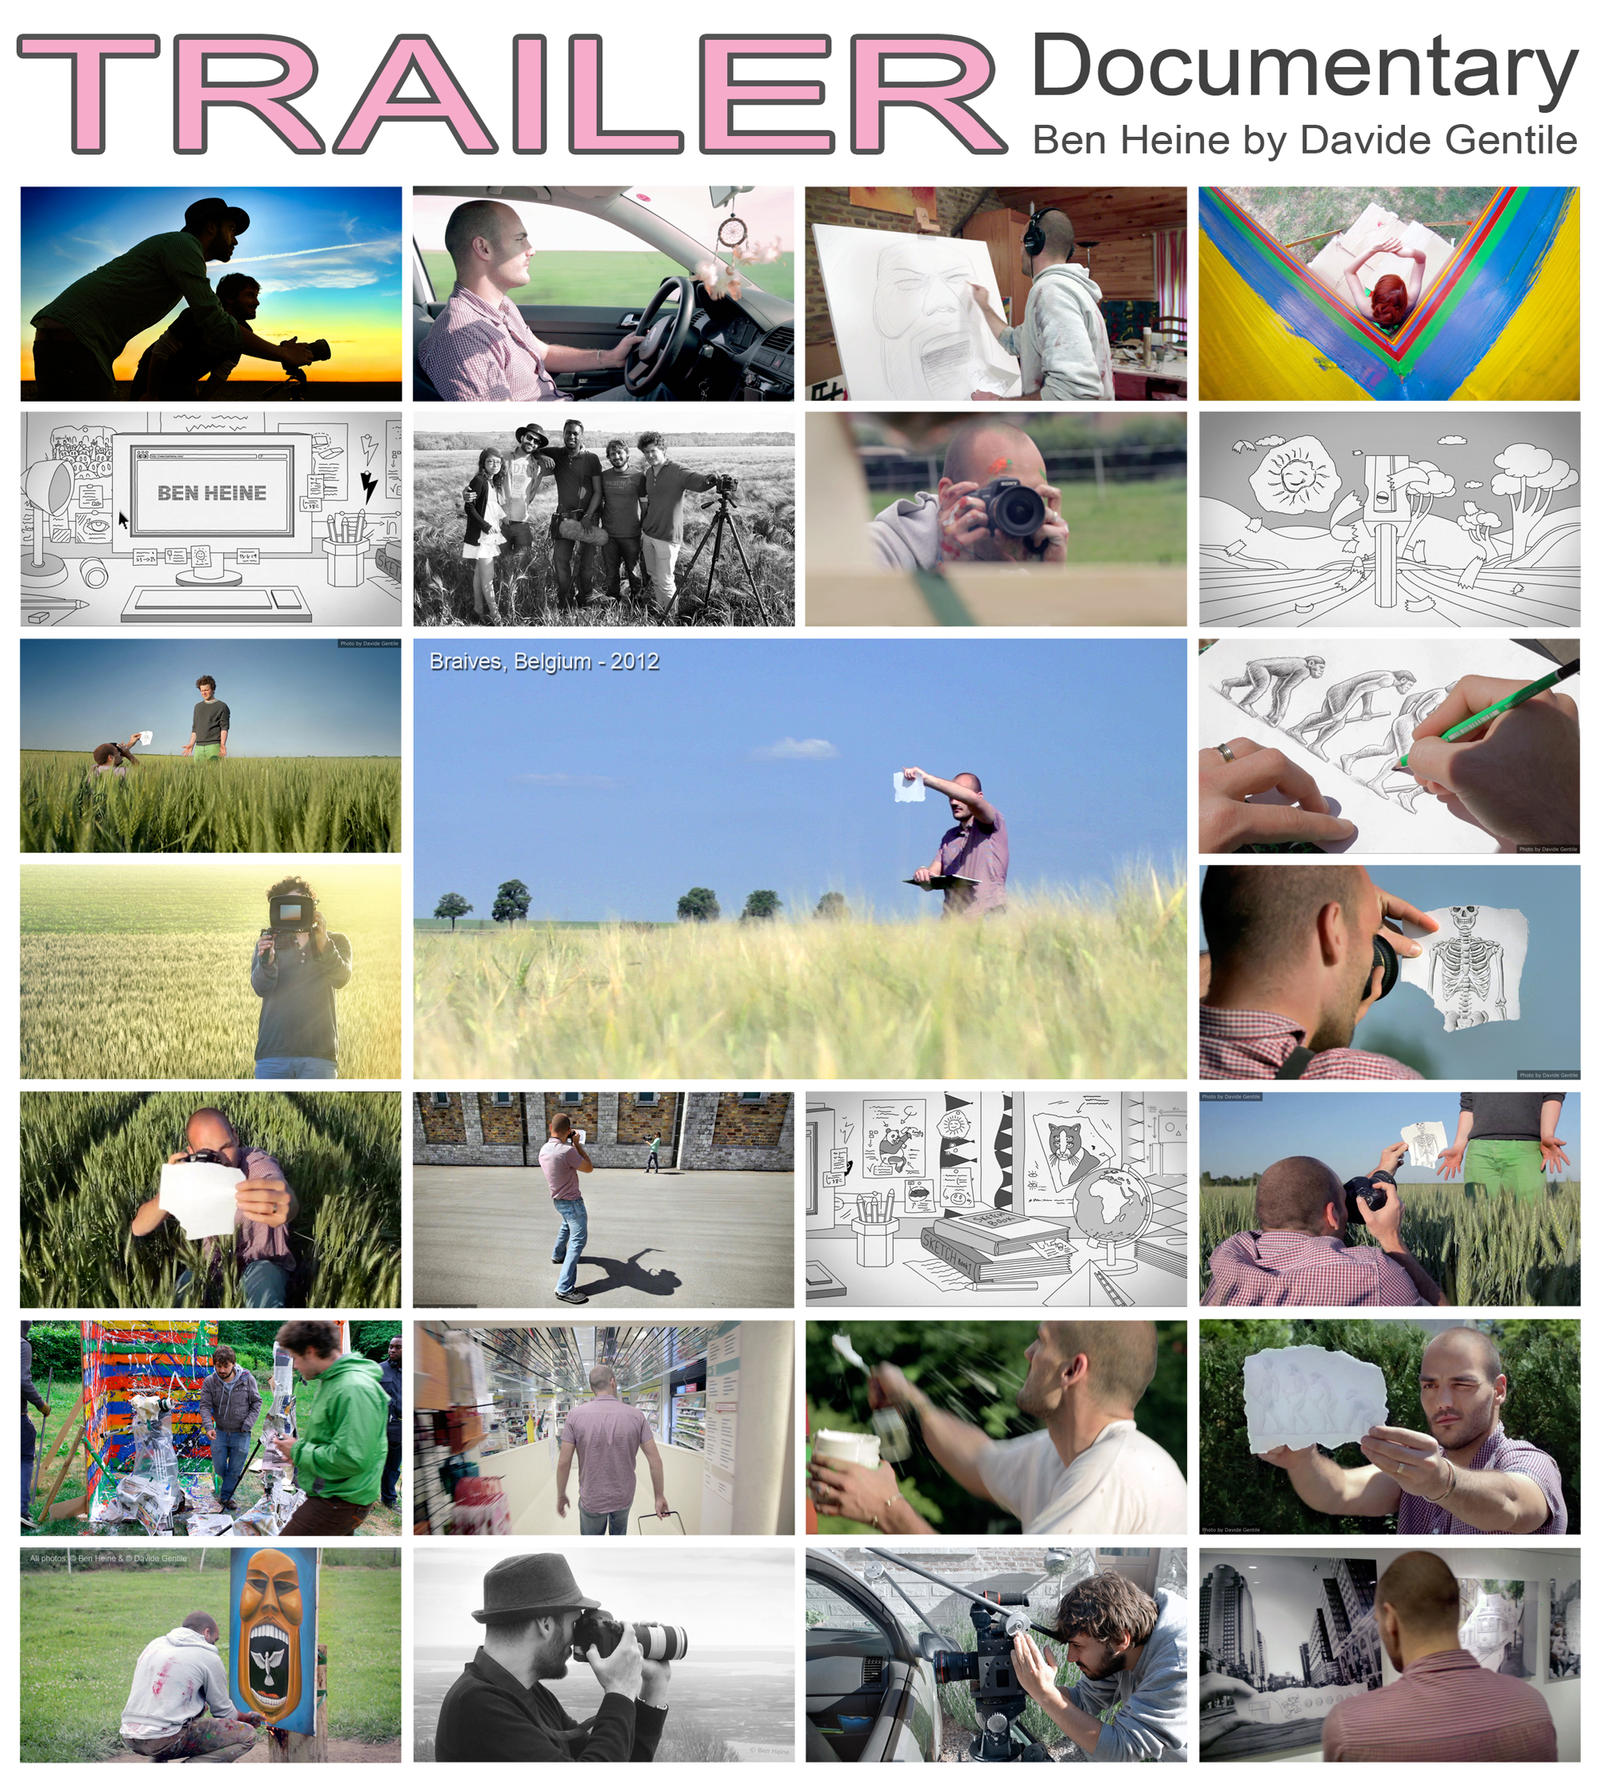 Trailer - Documentary (2012) by BenHeine